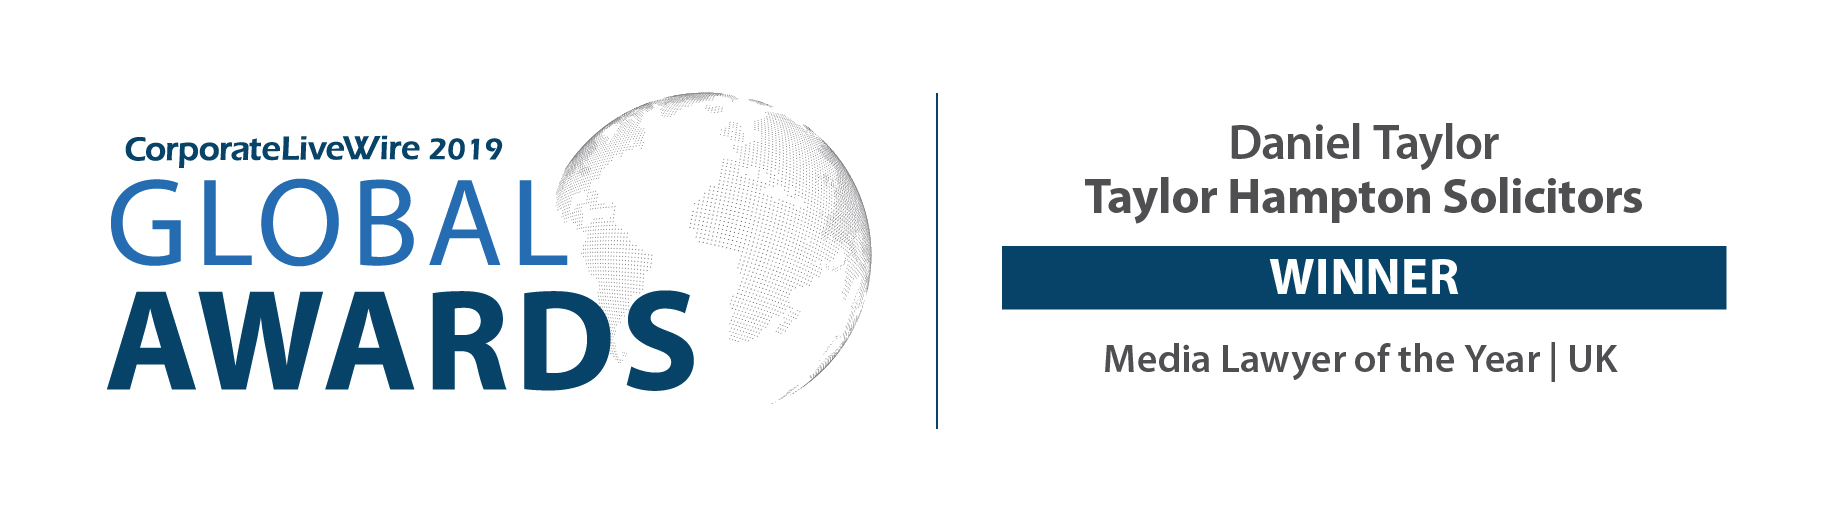 Internet Defamation Lawyers | Social Media Lawyers | Taylor